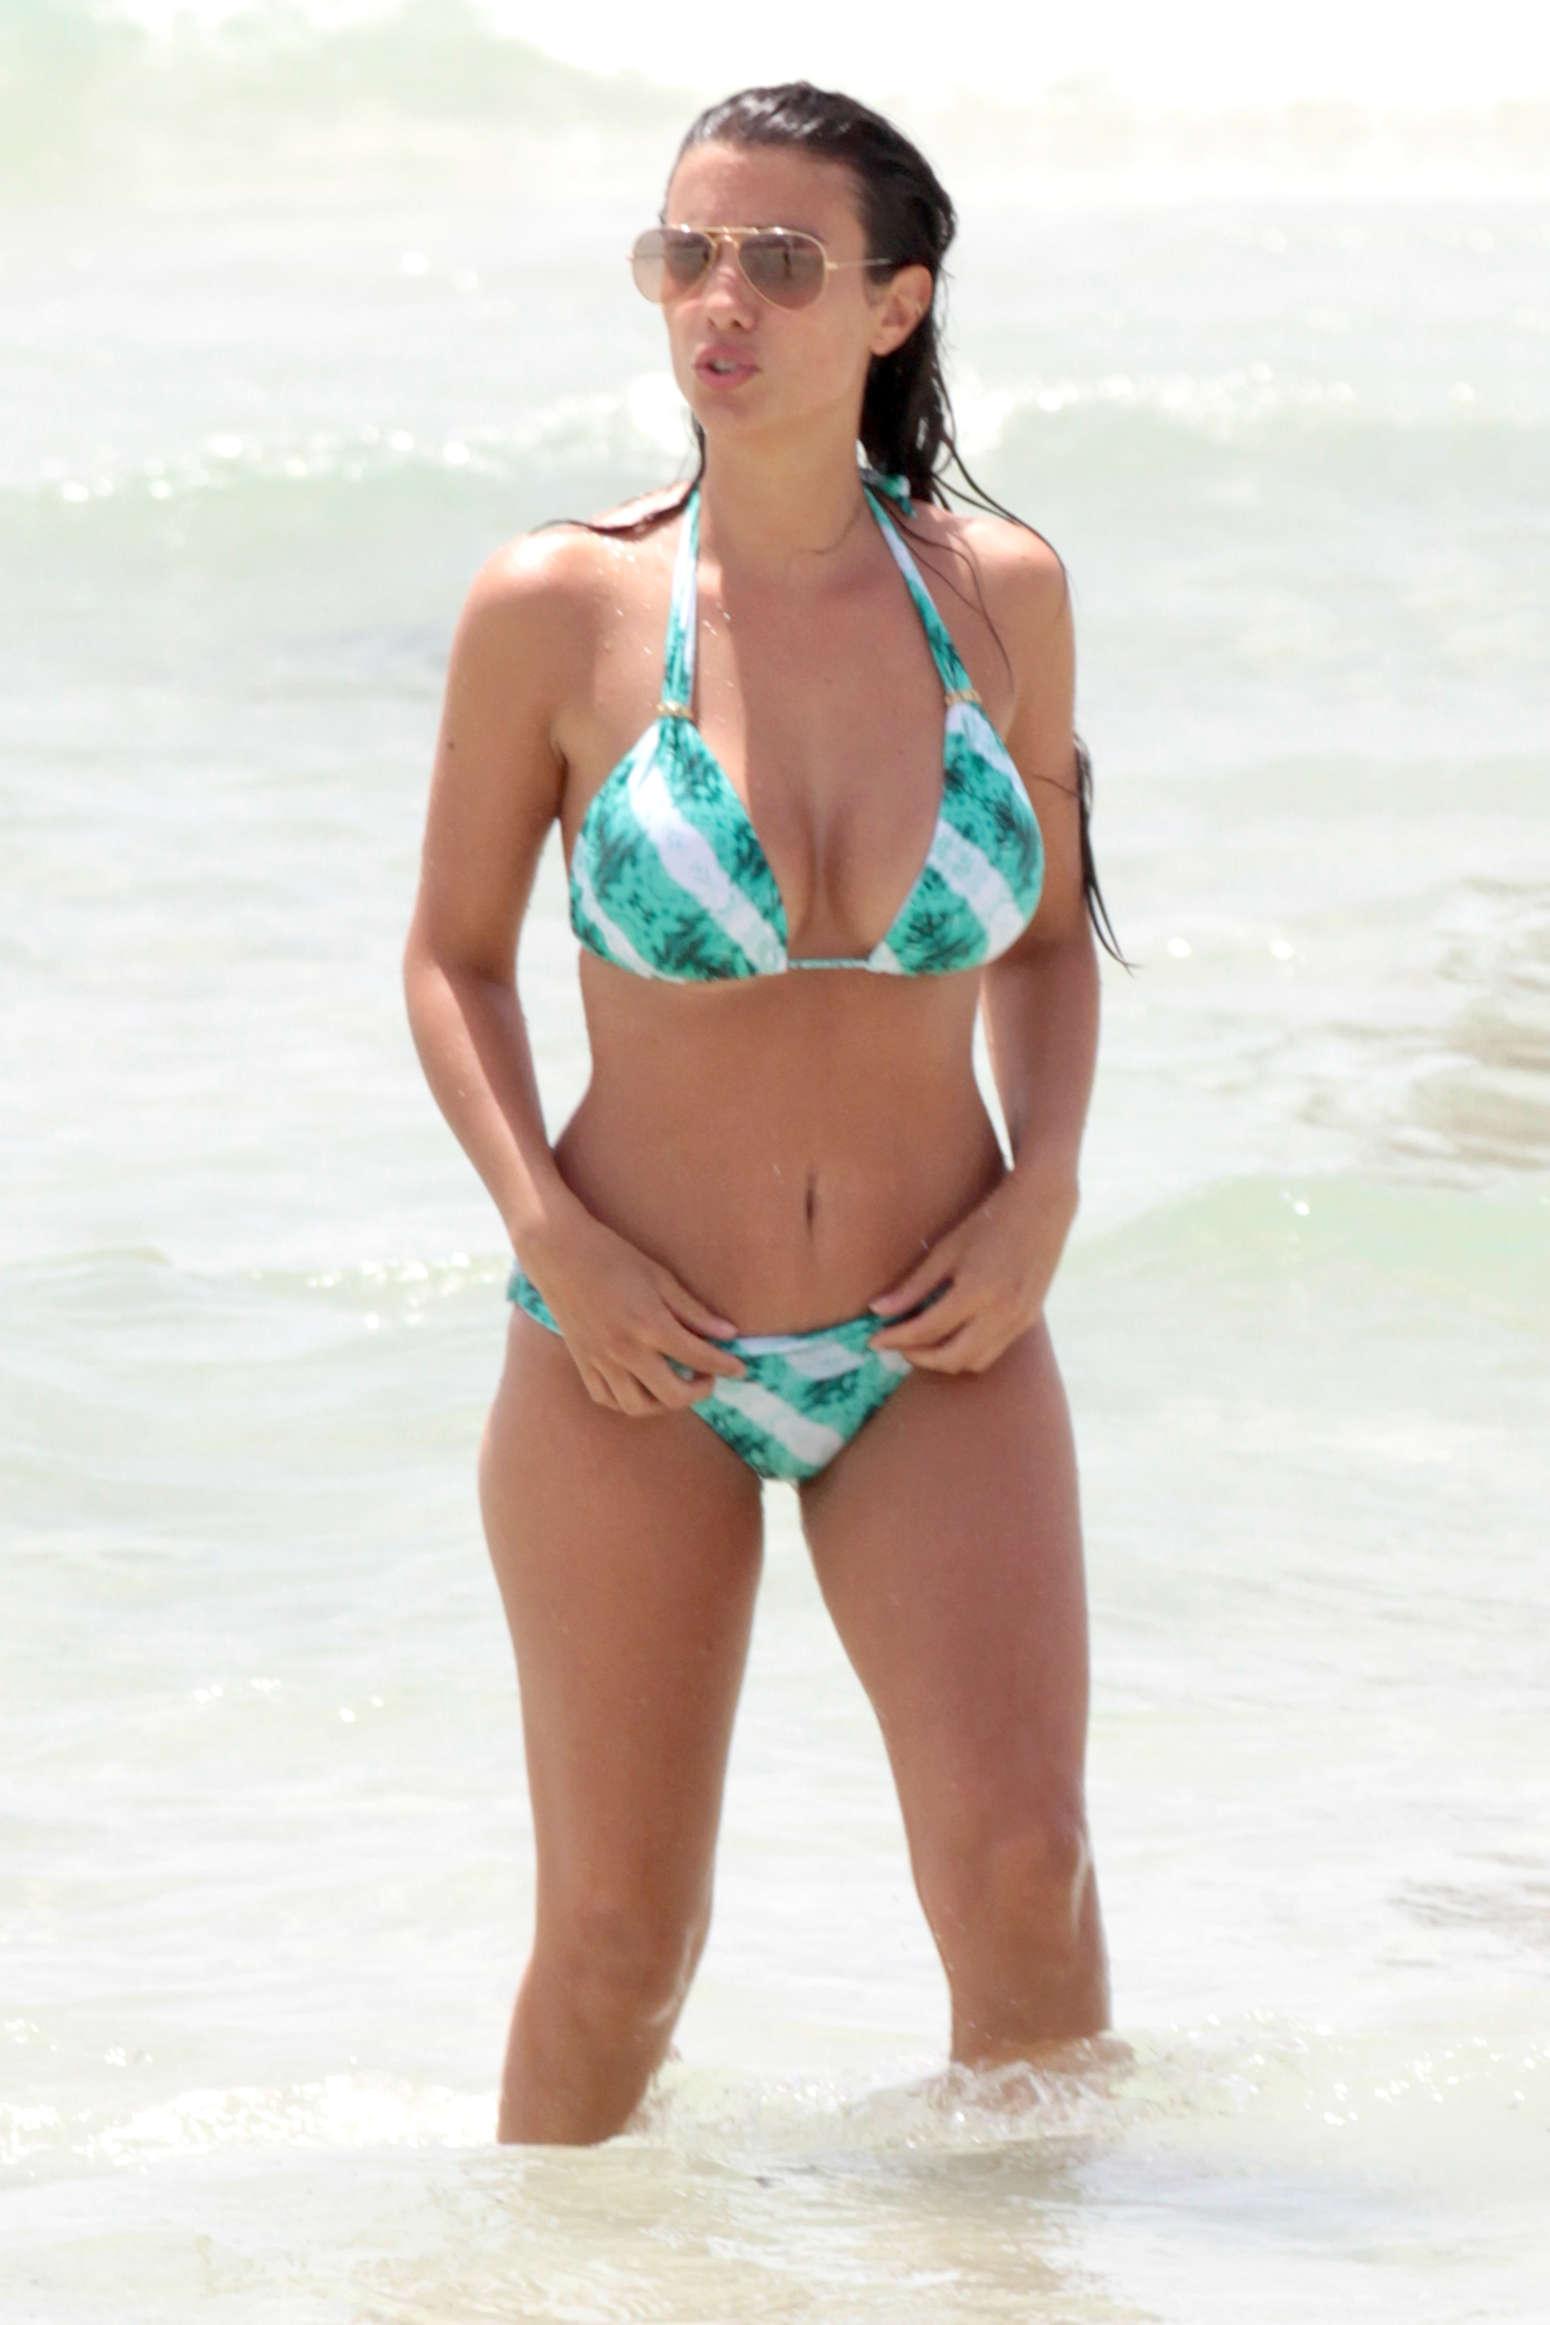 Snapchat Liana Mendoza nude (34 photo), Tits, Sideboobs, Selfie, panties 2020